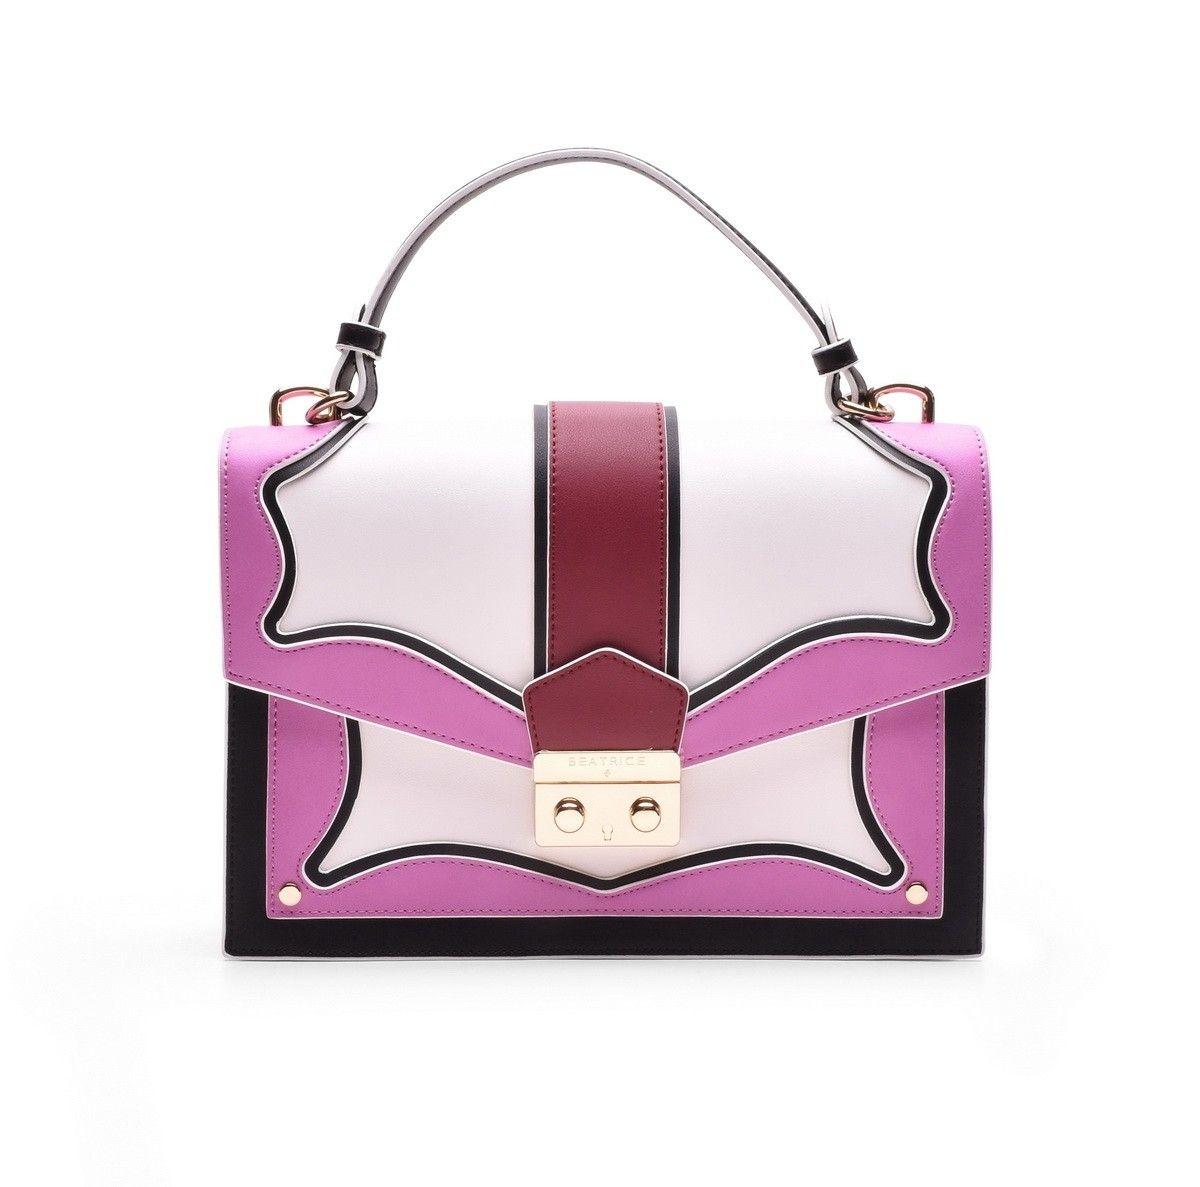 BEATRICE B. - Damen Tasche - Tessuto Skin Bag - Pink/Berry